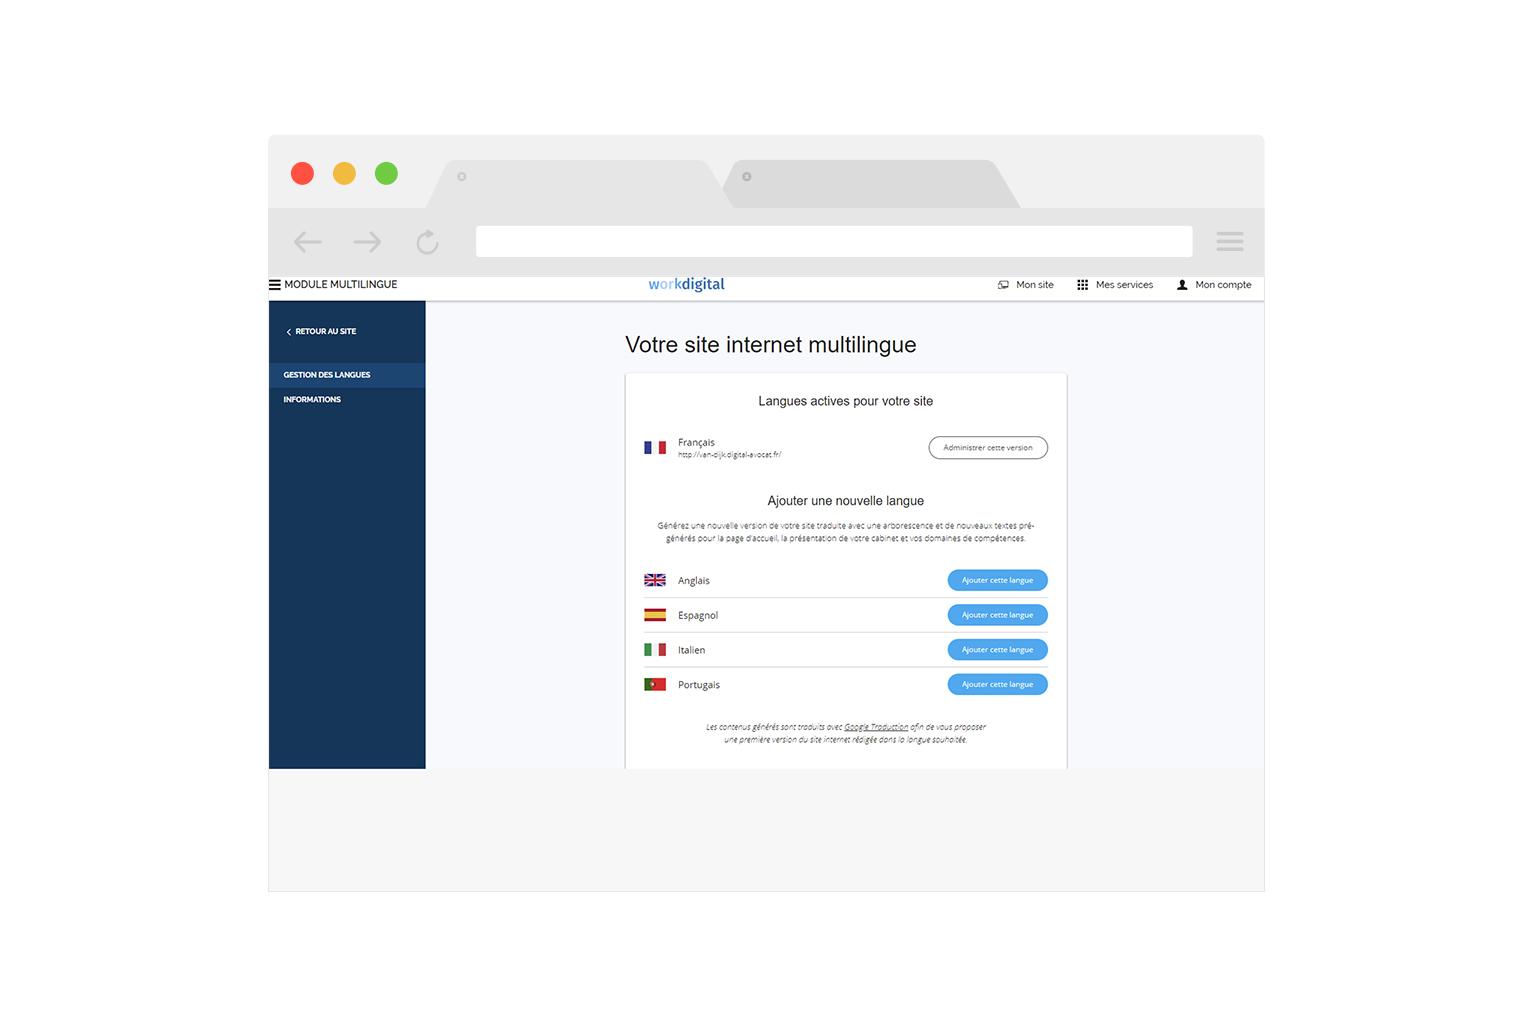 workdigital-fonction-multi-lingue